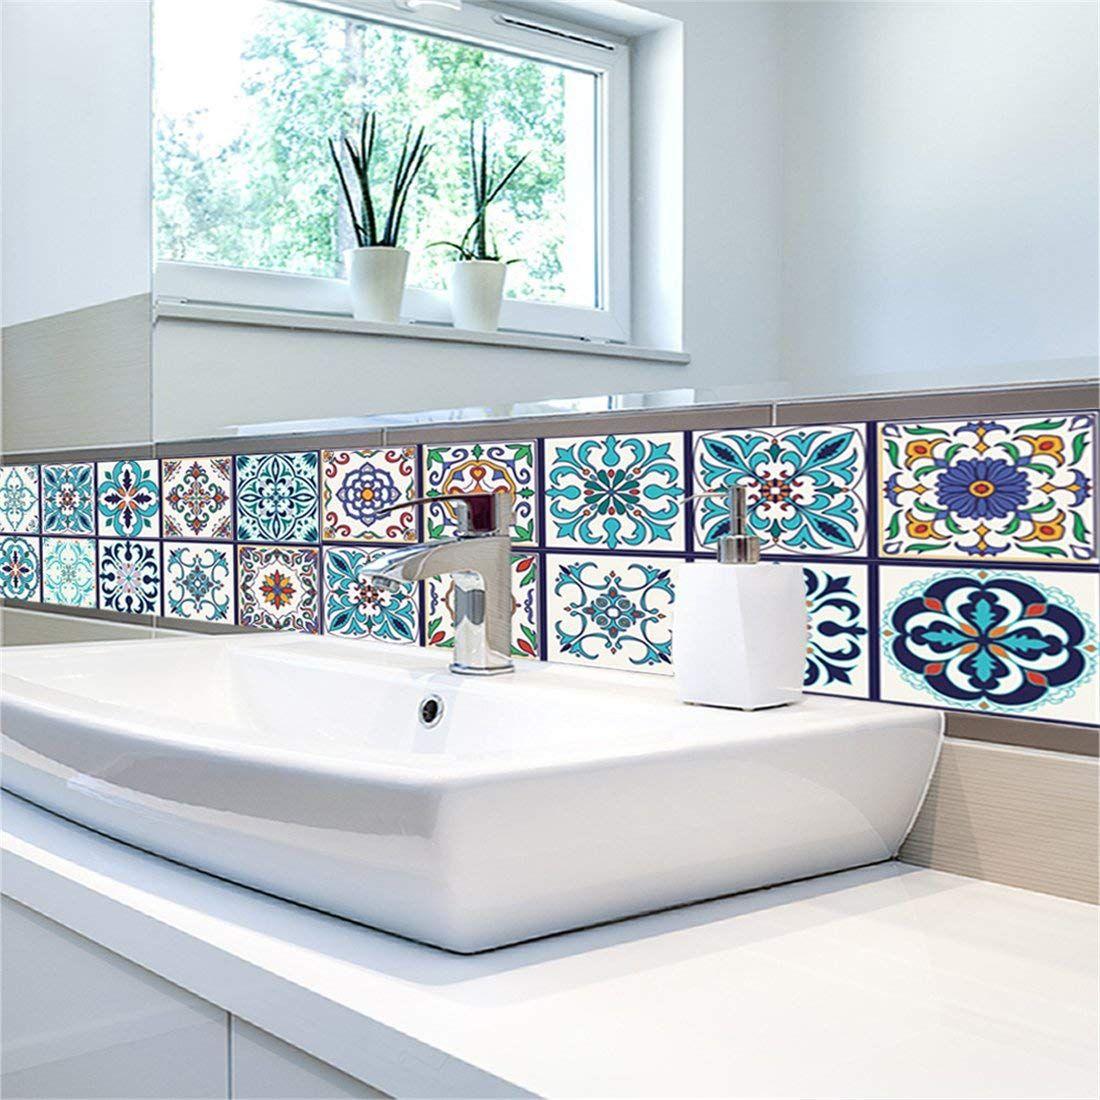 wandfliesen aufkleber bad aufkleber fliesen genial. Black Bedroom Furniture Sets. Home Design Ideas